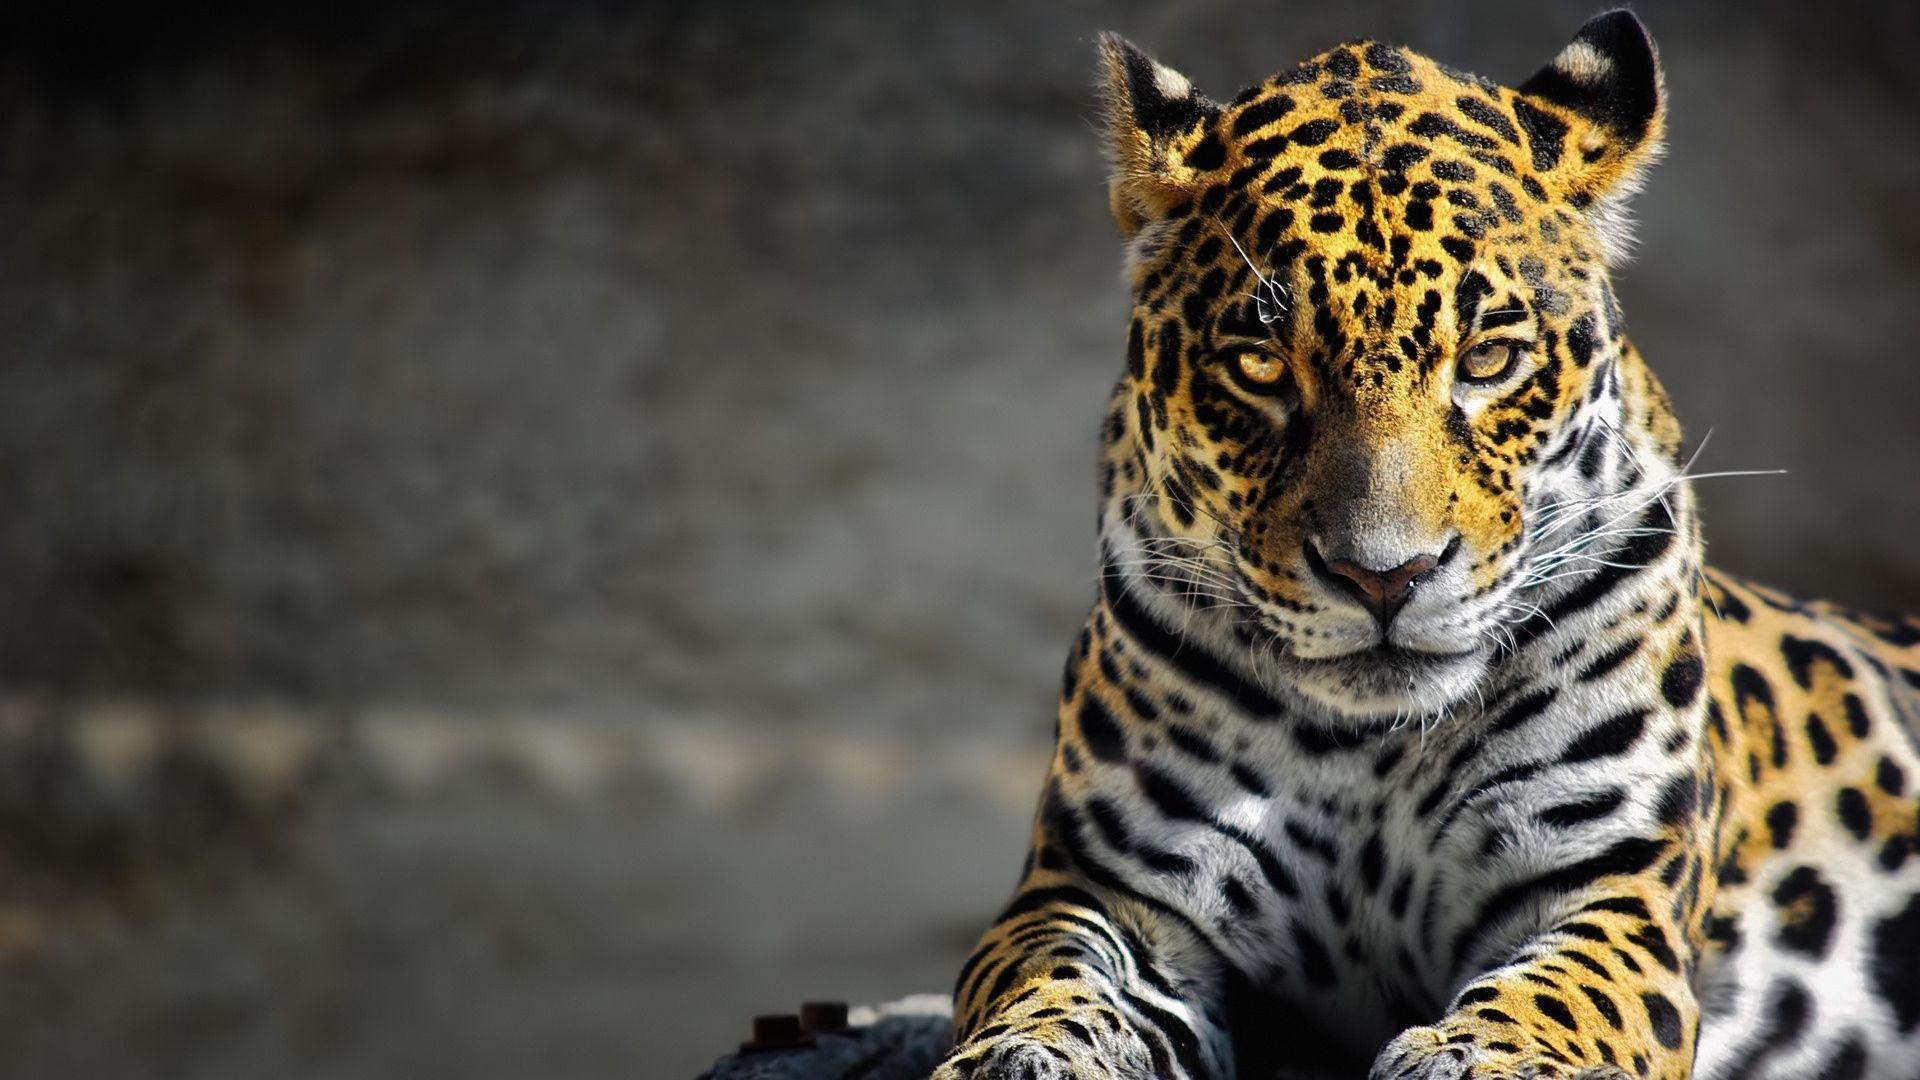 Downloadcheetah, Lie, Wild Cat, Spotted Wallpaper, Background